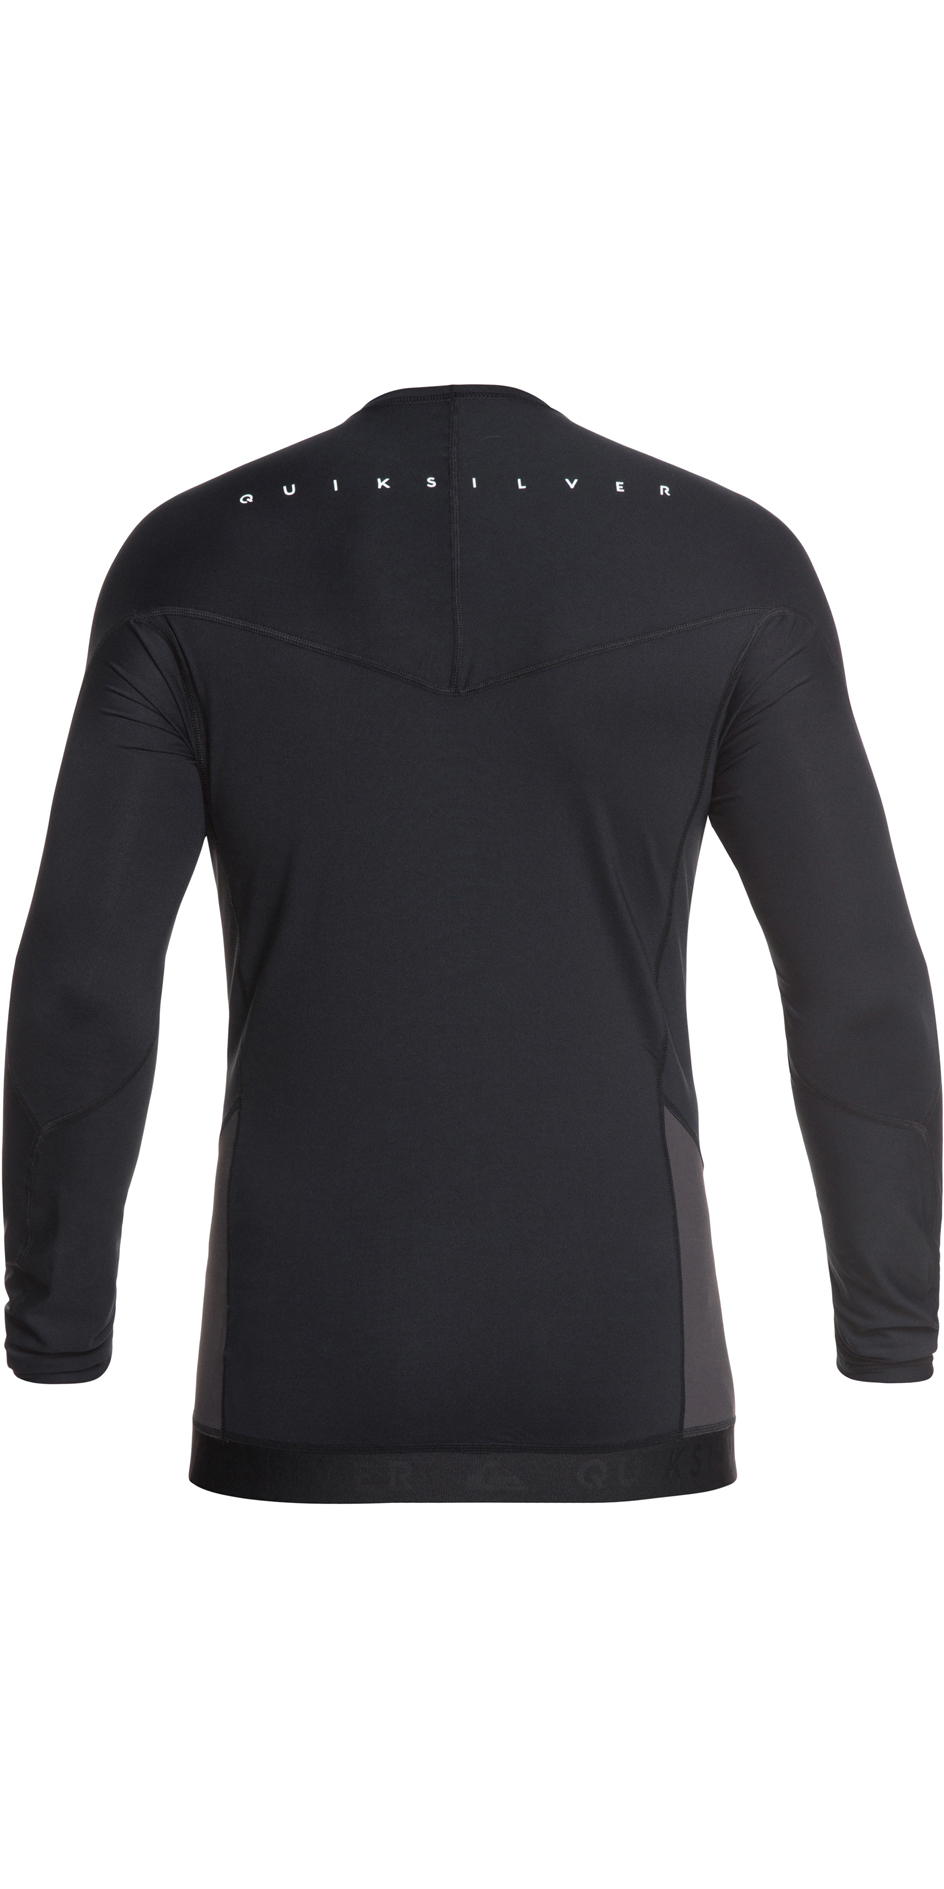 2019 Quiksilver Core Performer Long Sleeve Rash Vest Black EQYWR03157